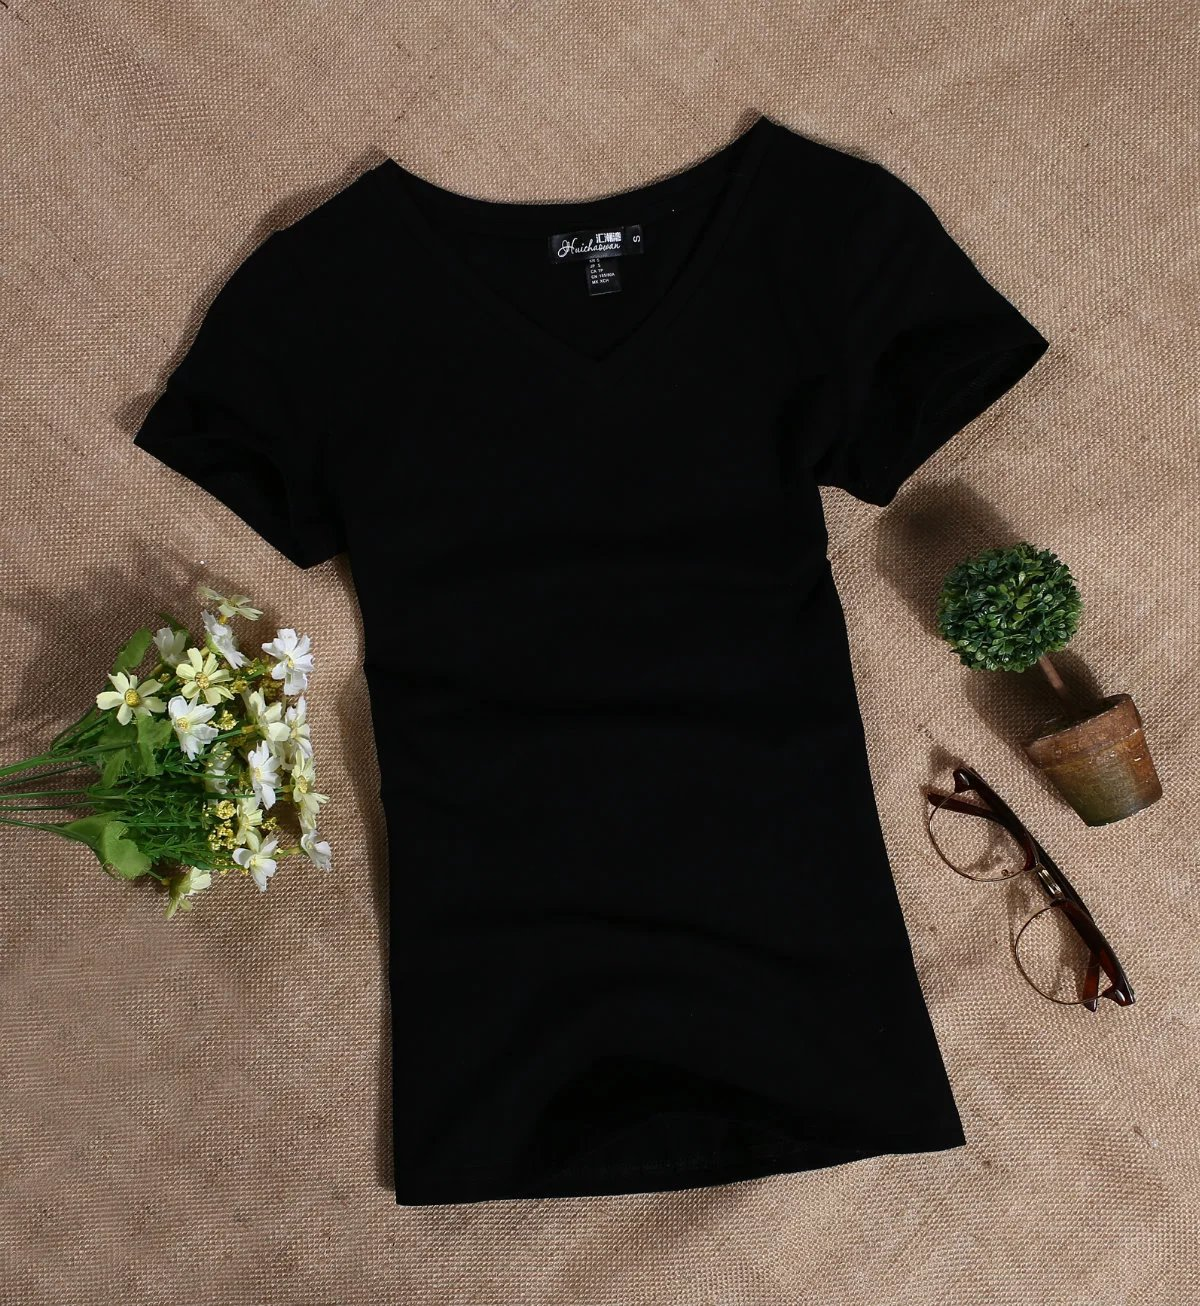 MRMT 2020 Women's T Shirt Women Short Sleeved Slim Solid Color Womens Simple Tee T-Shirt For Female Tshirt 2